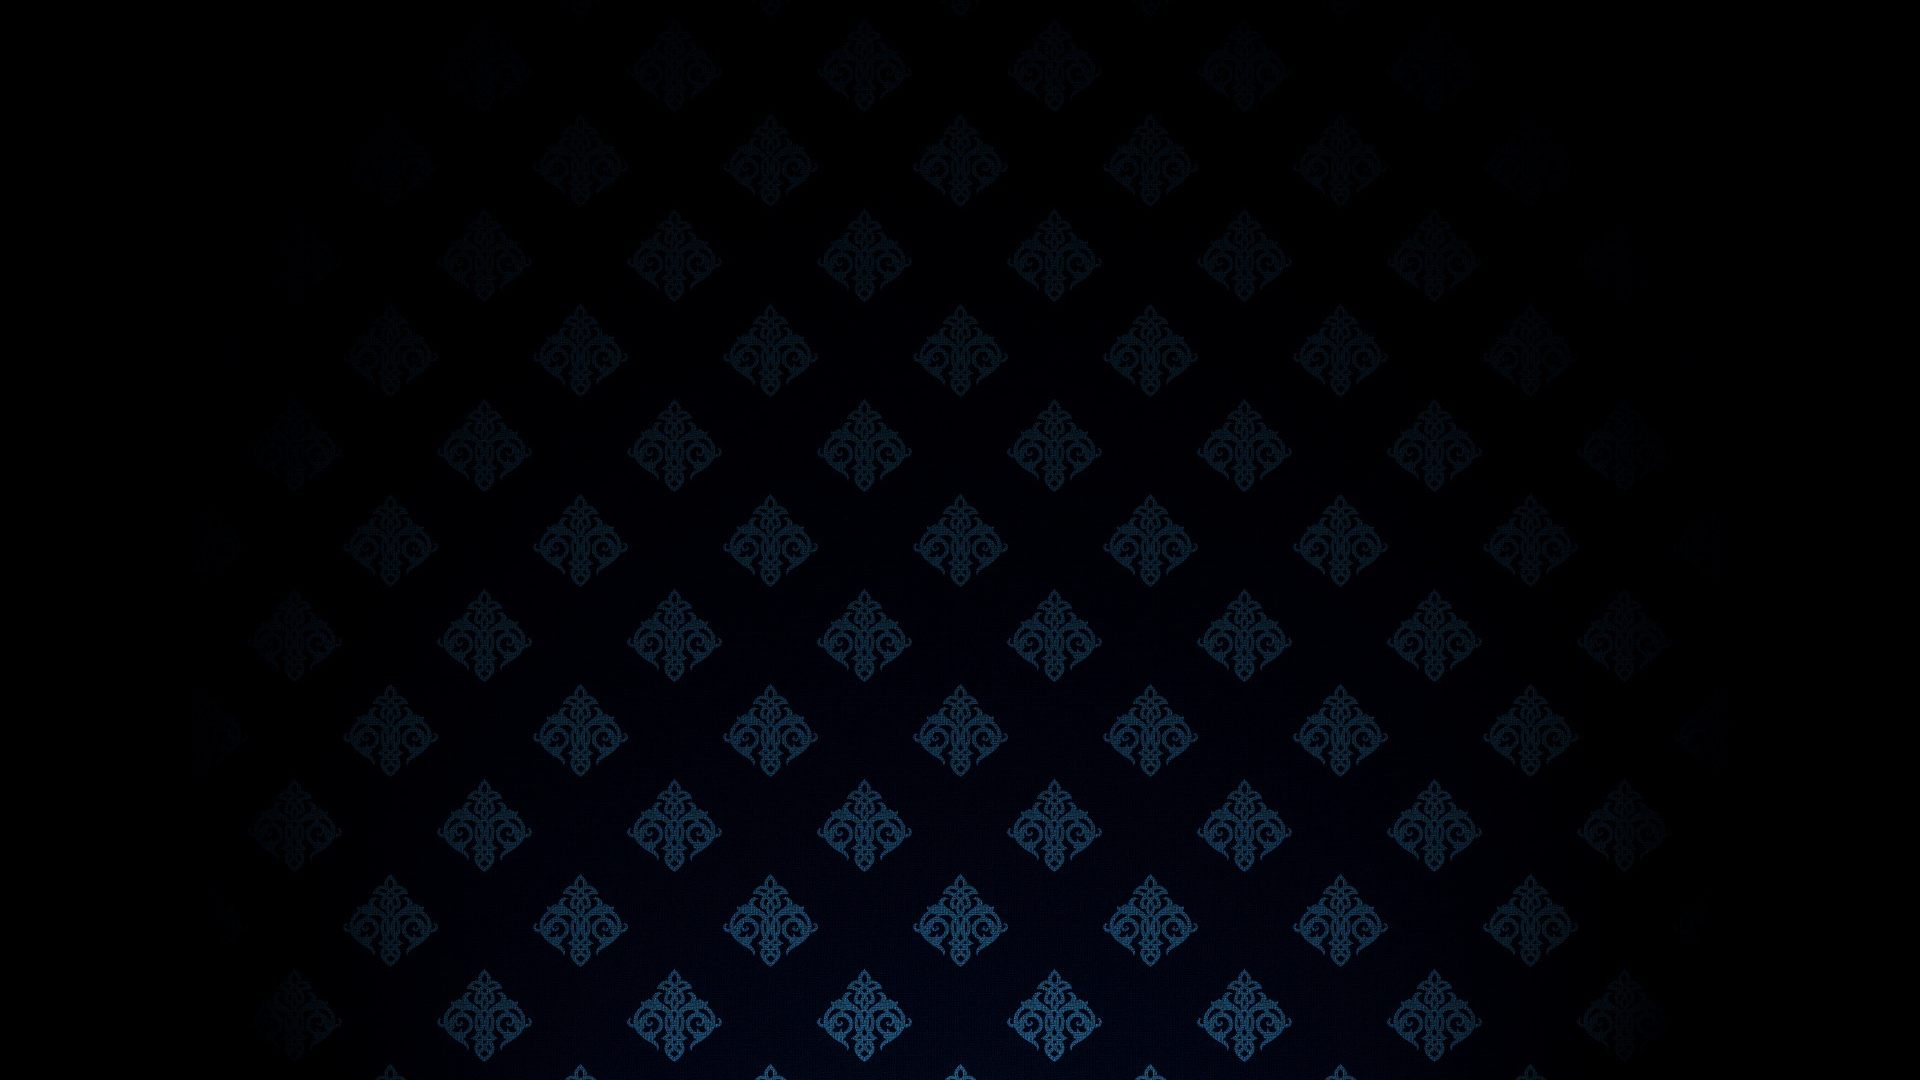 Download Wallpaper 1920x1080 Texture Pattern Black Background